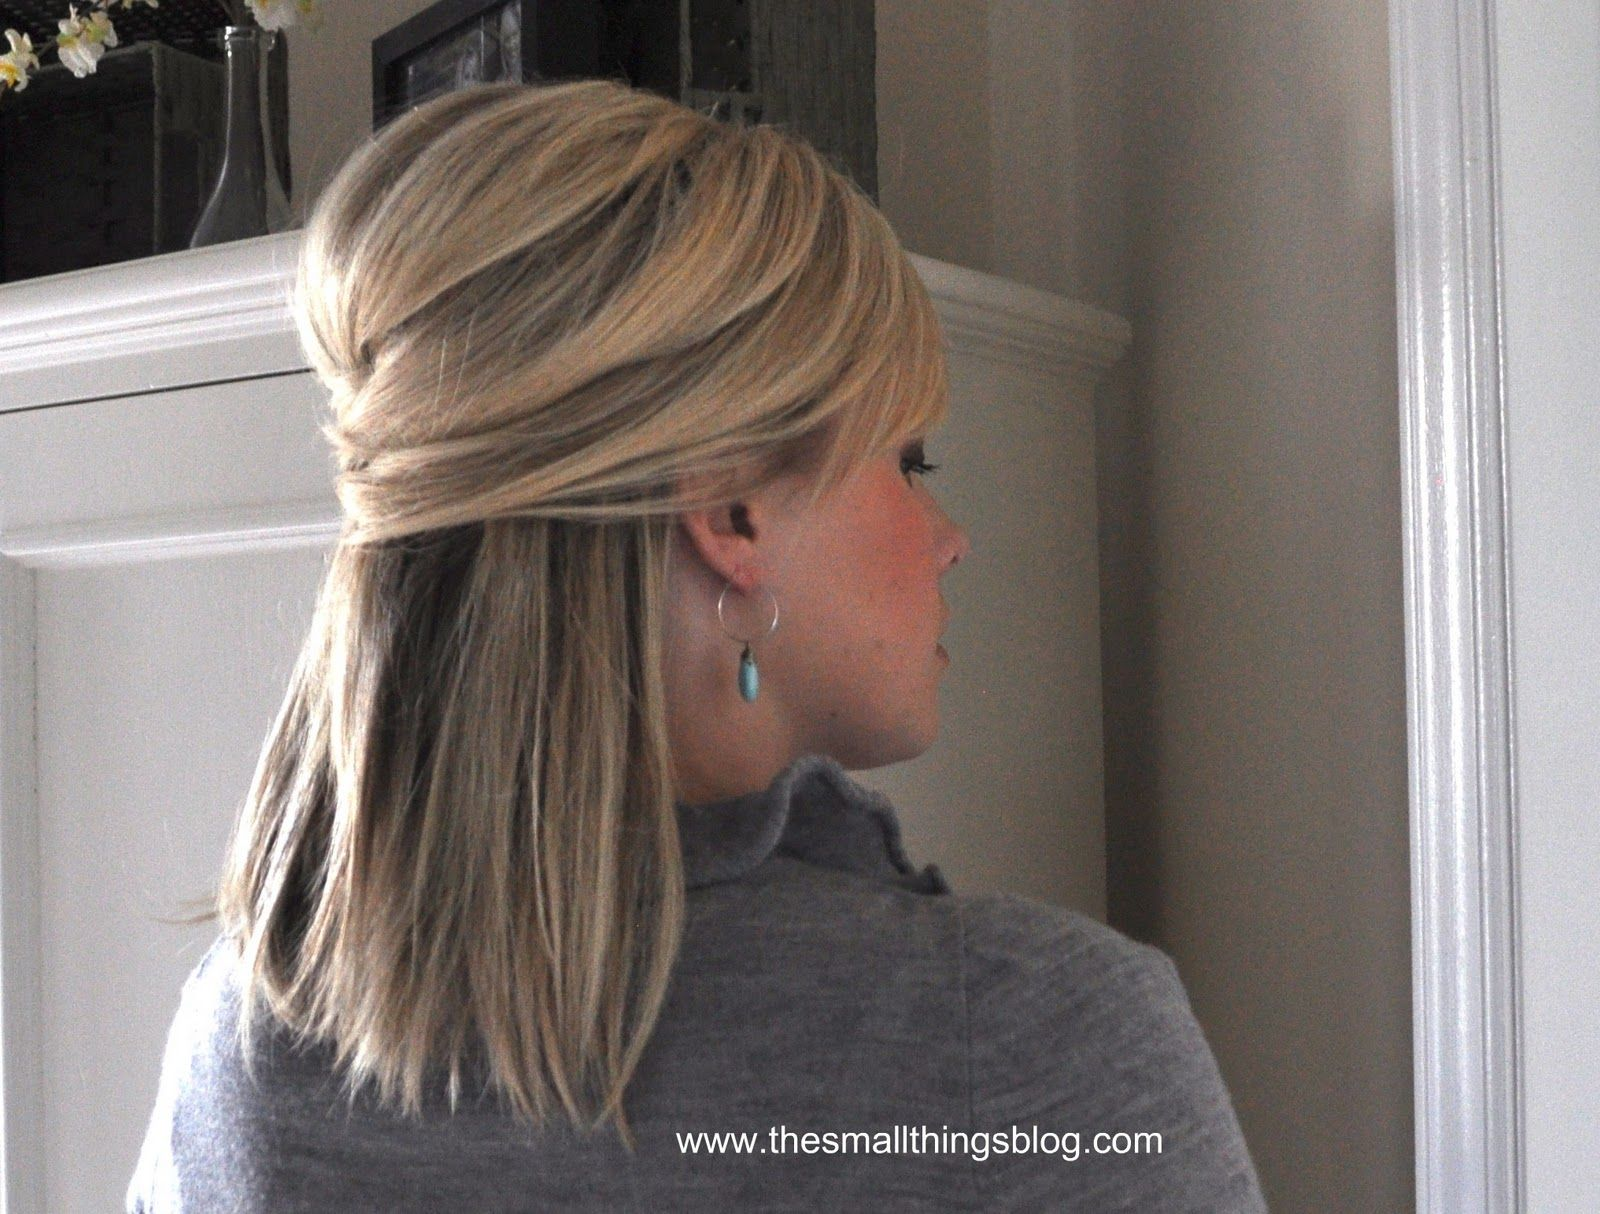 Formal Hairstyles For Medium Straight Hair Straight Hairstyles Medium Medium Length Hair Styles Straight Wedding Hair